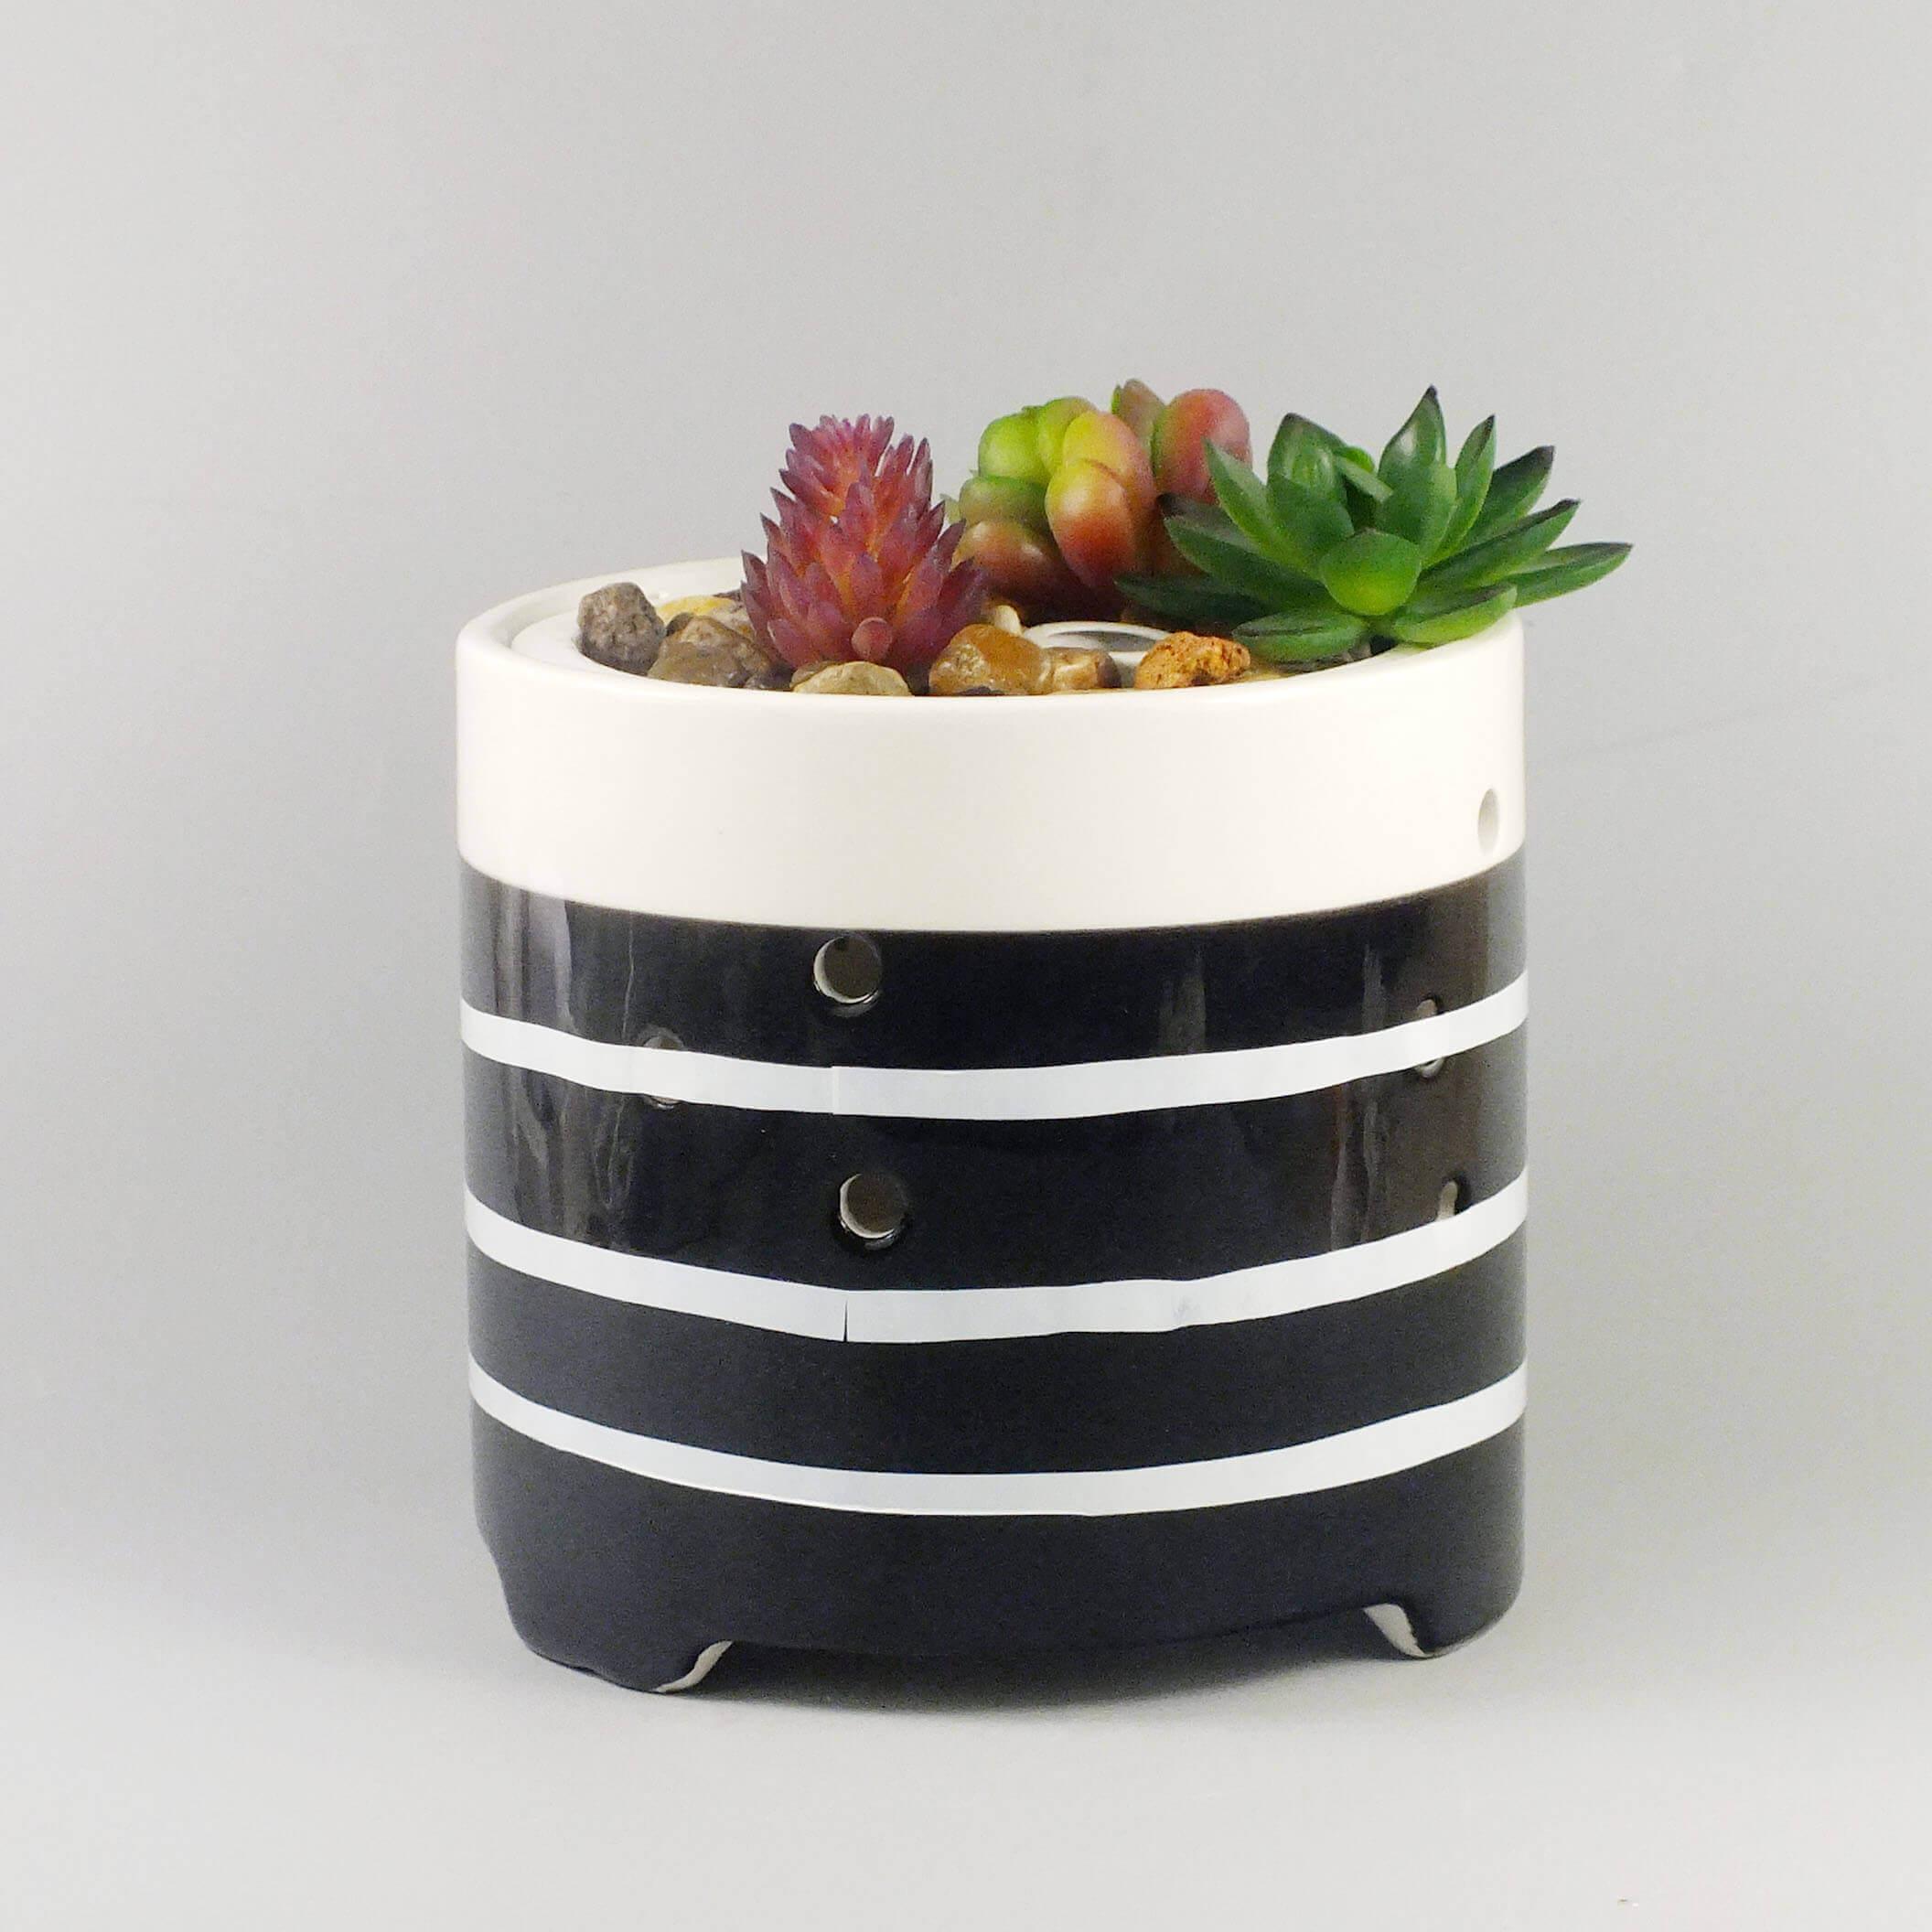 Hot-ultrasonic-aroma-mist-diffuser-GLEA20104S